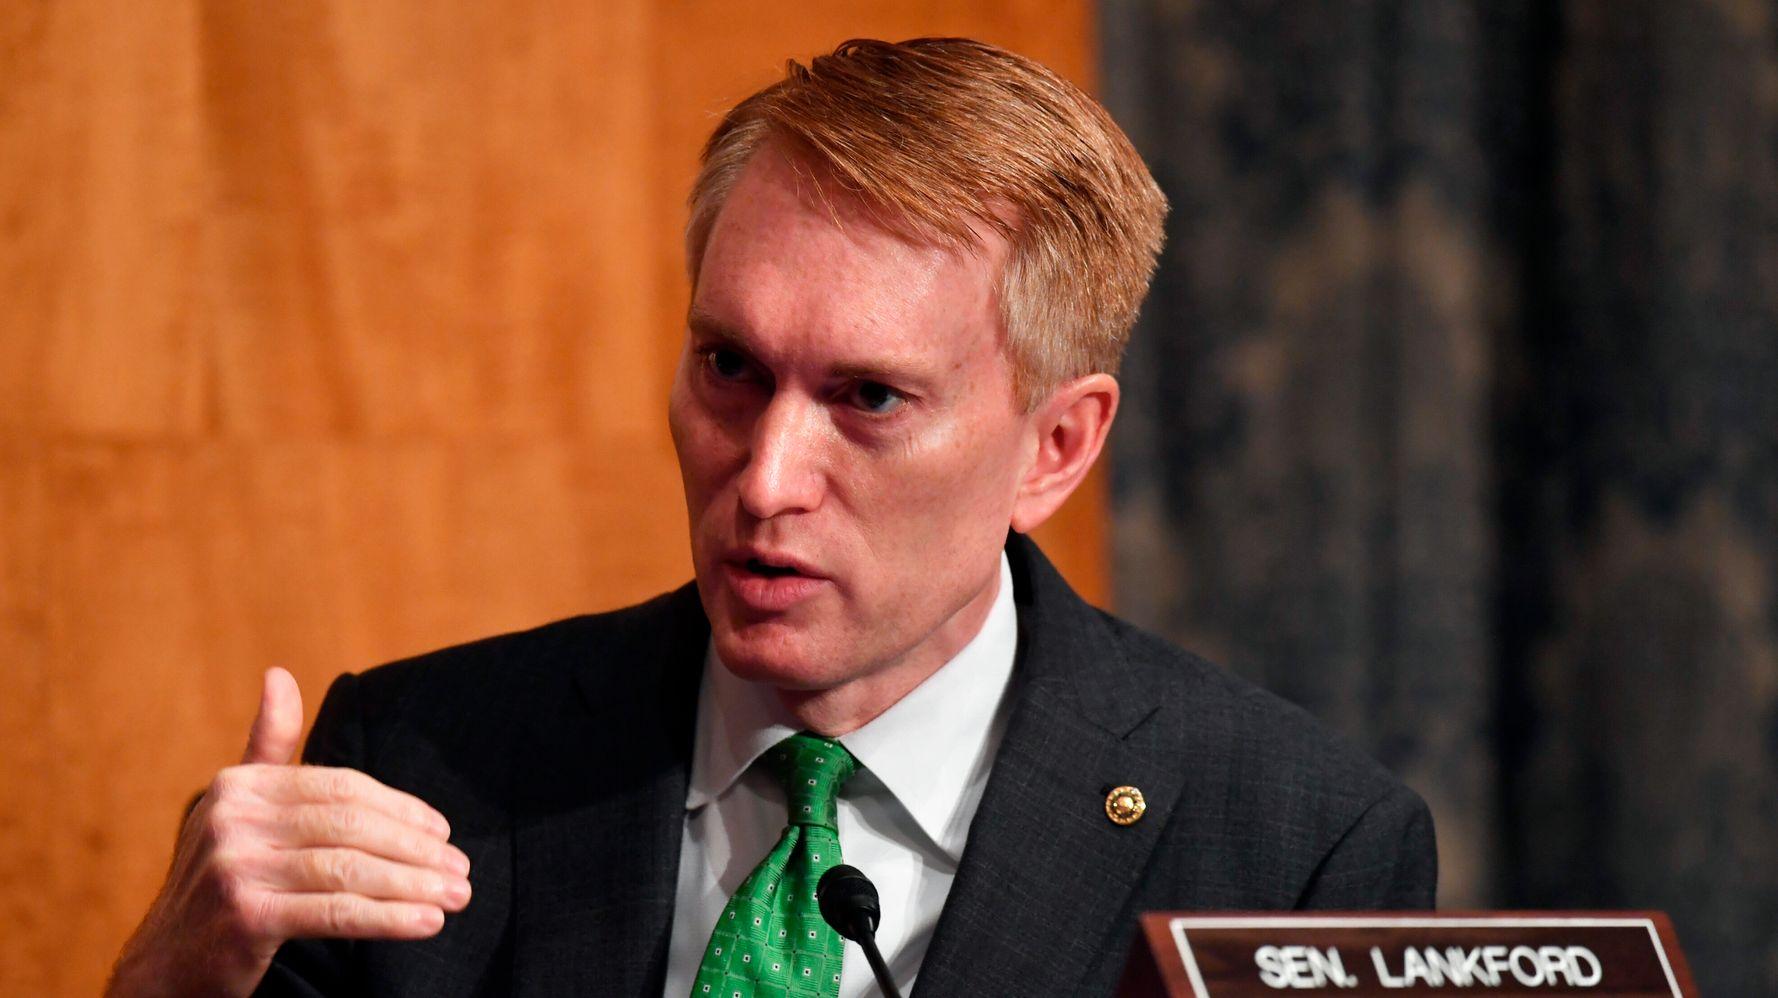 GOP Senator Says He Will Intervene If Biden Isn't Granted Access To Intel Briefings Soon